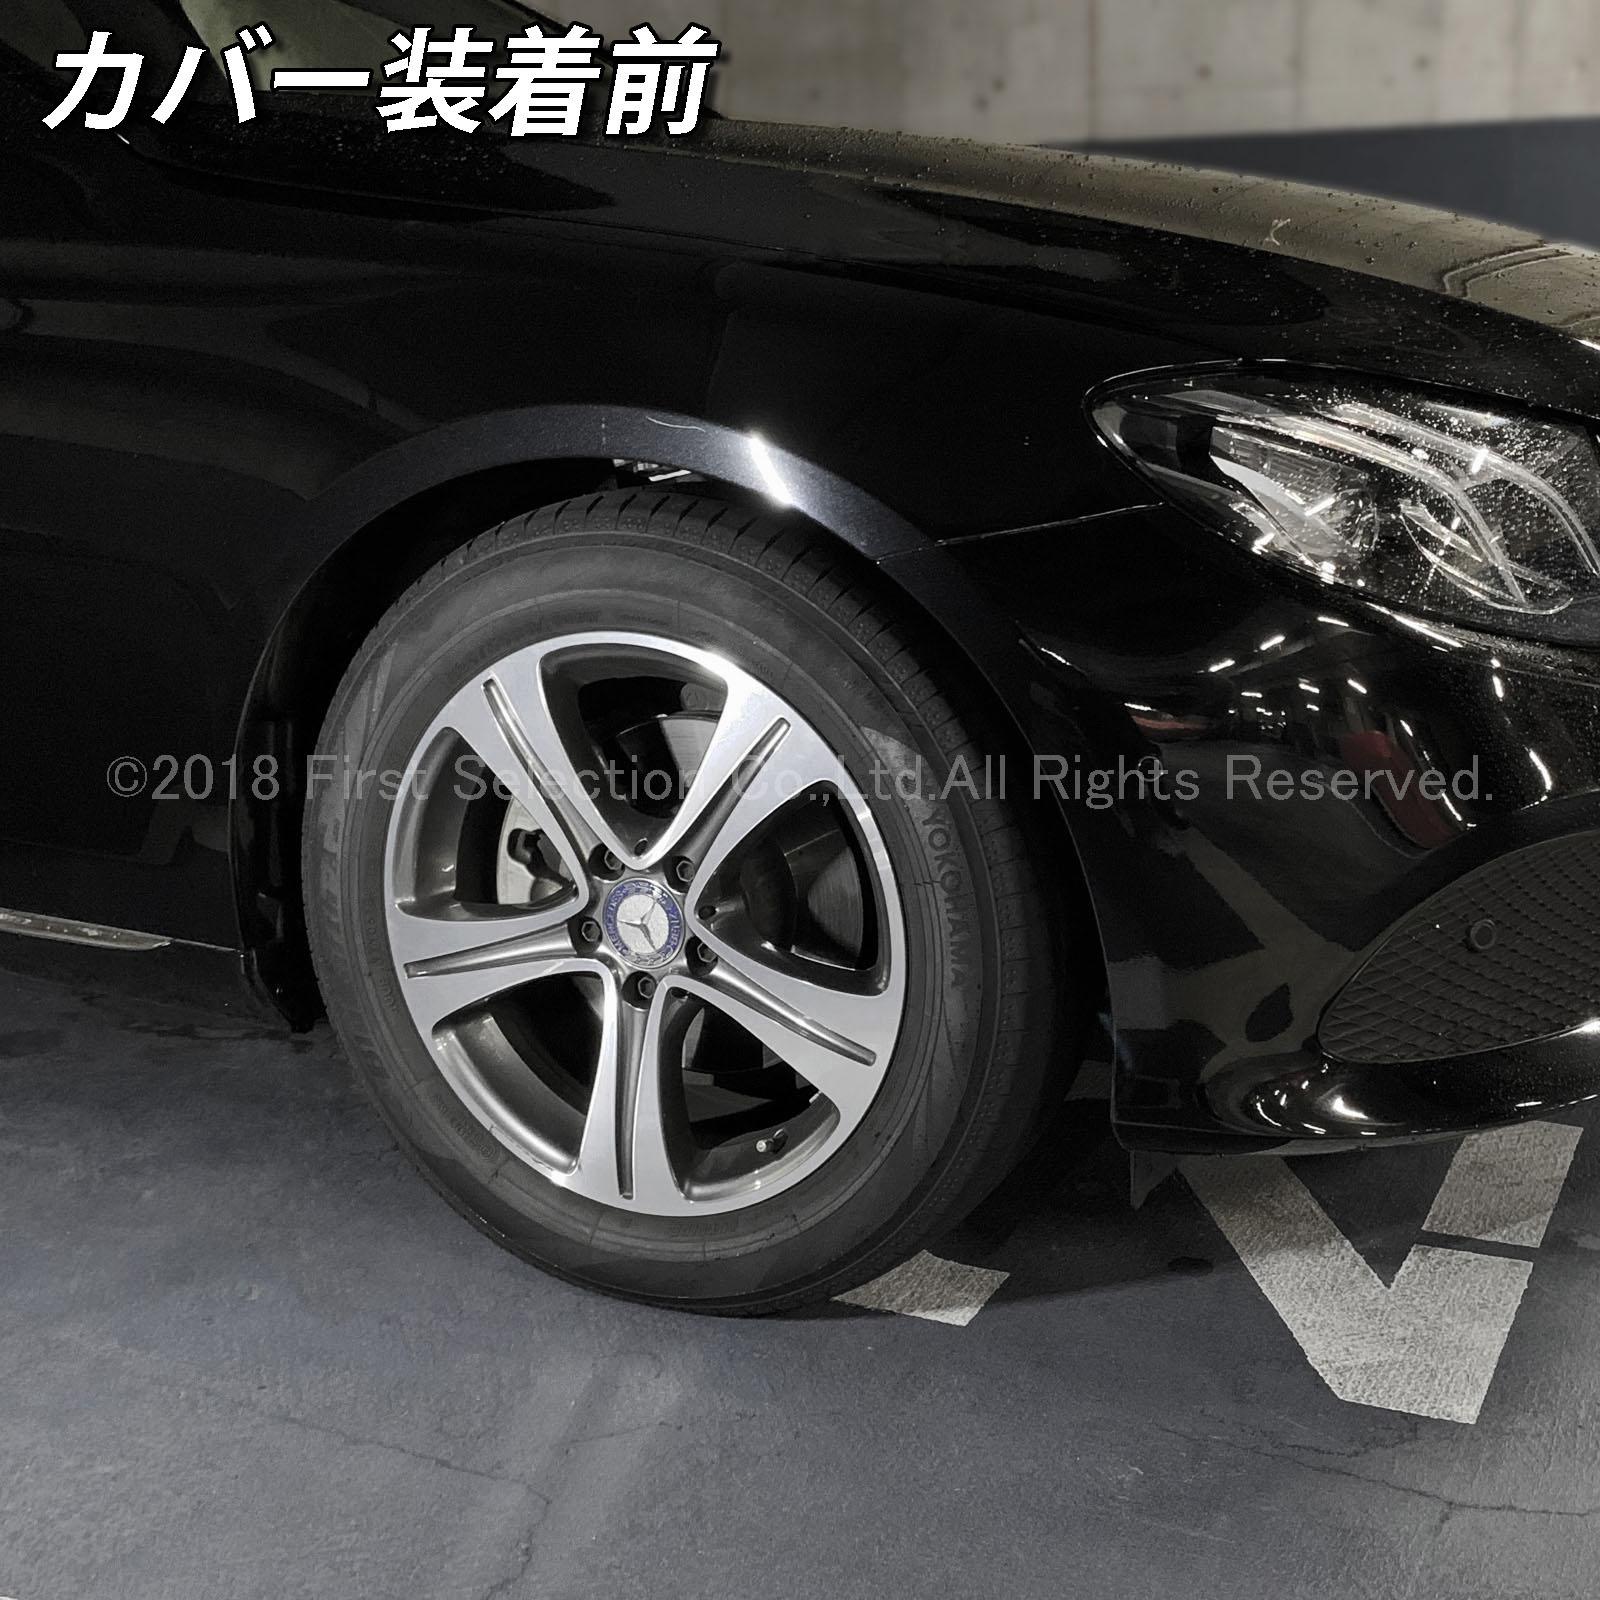 Mercedes-Benz ベンツ AMG銀文字 Eクラス W213 S213用 高耐久金属製キャリパーカバーセット赤 W213 S213 E200アバンギャルド E200 4MATIC AVANTGARDE E220dアバンギャルド